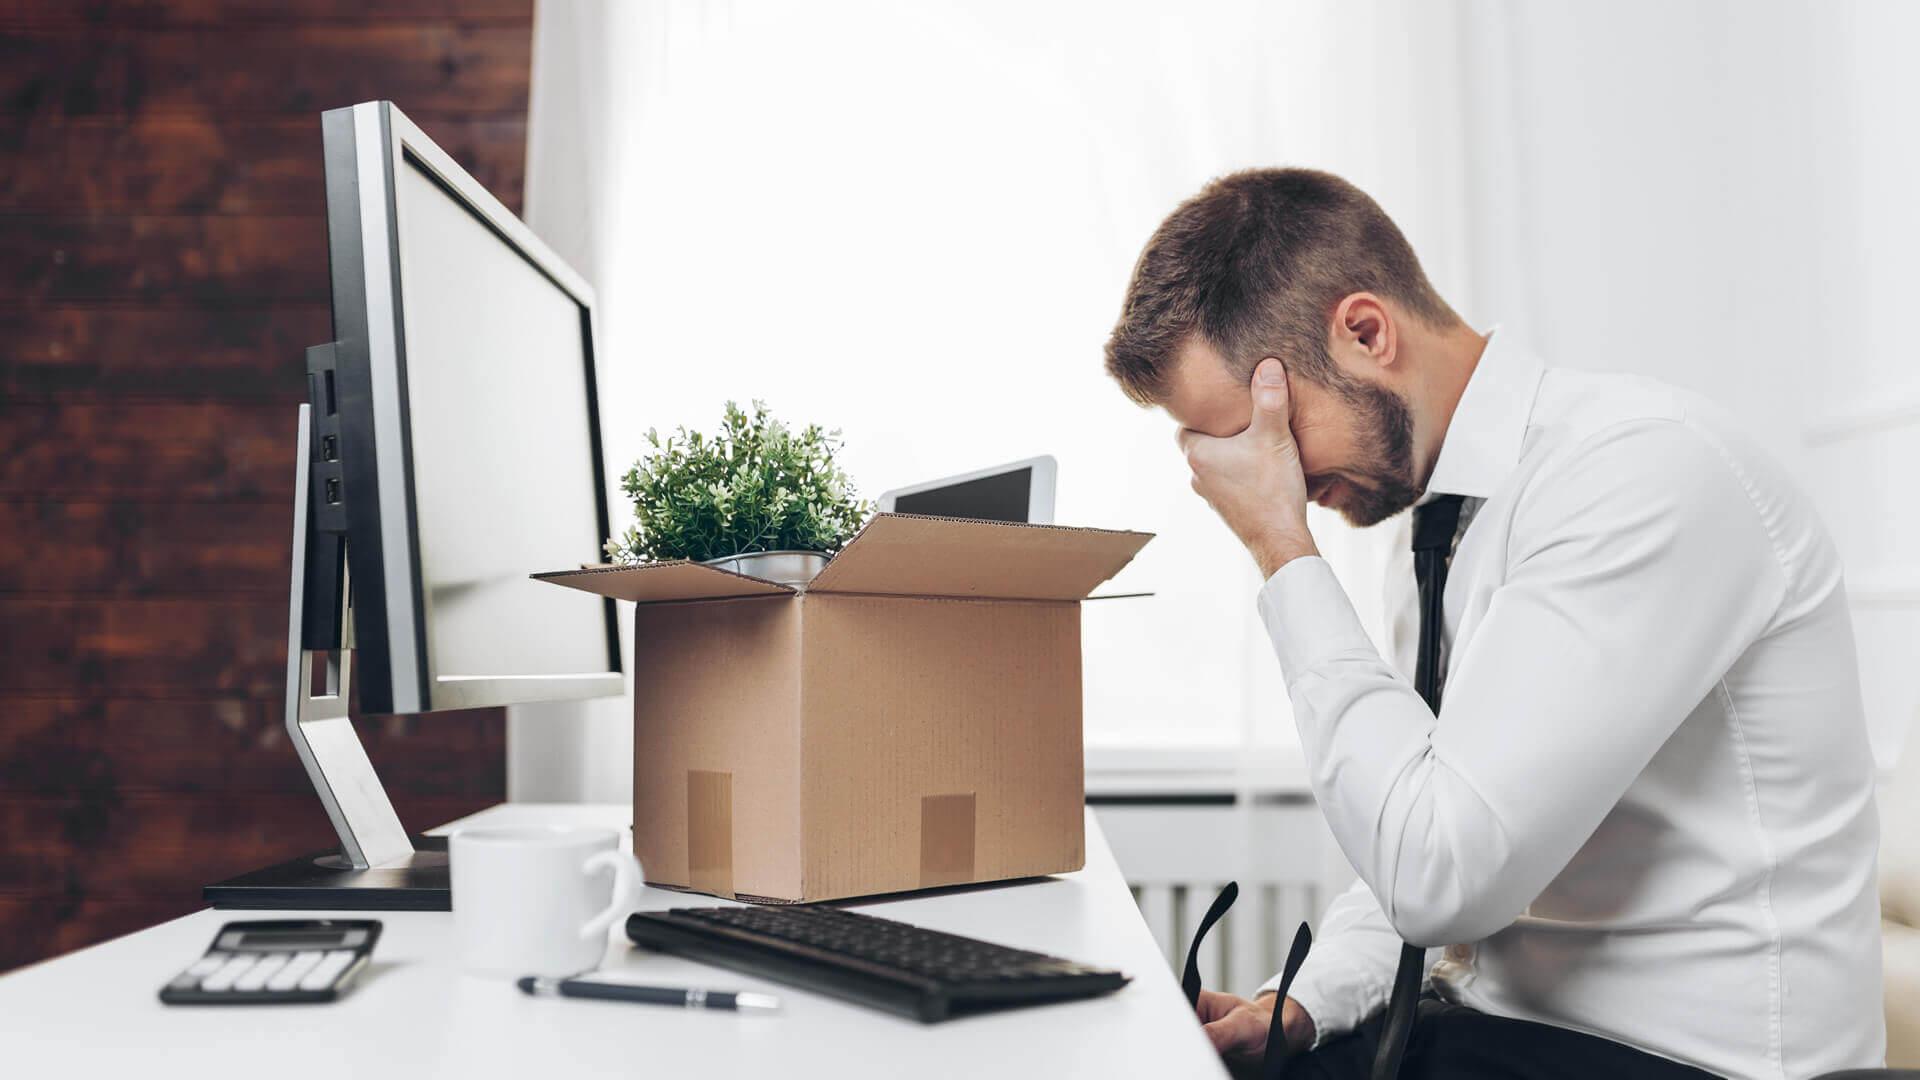 Filing a Employment Lawsuit Claim